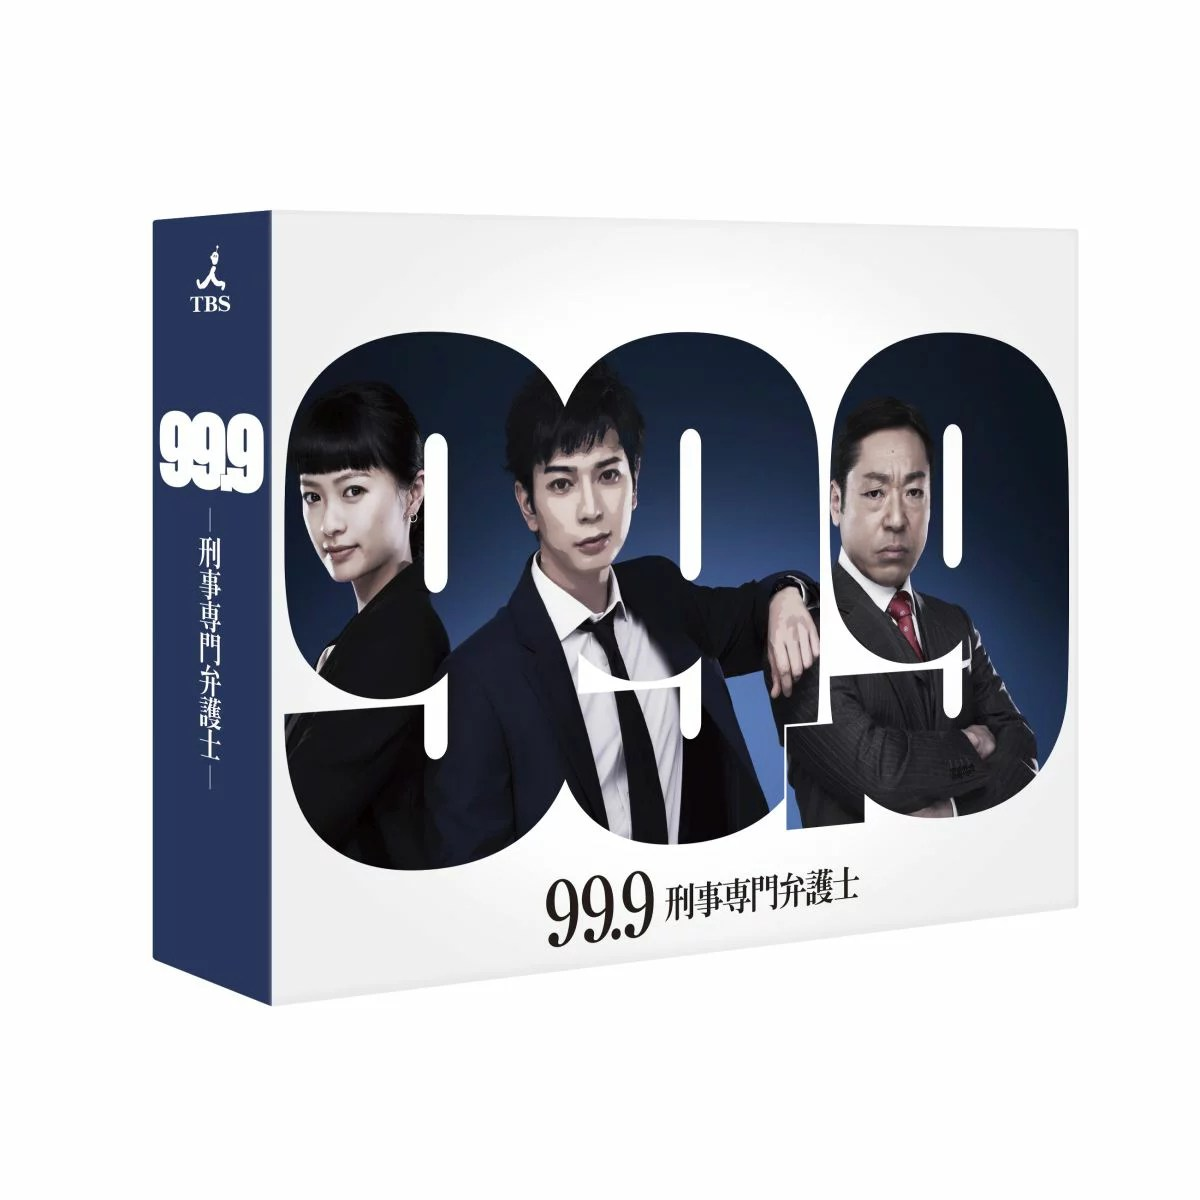 99.9-刑事専門弁護士ーBlu-ray BOX【Blu-ray】 [ 松本潤 ] - 楽天ブックス